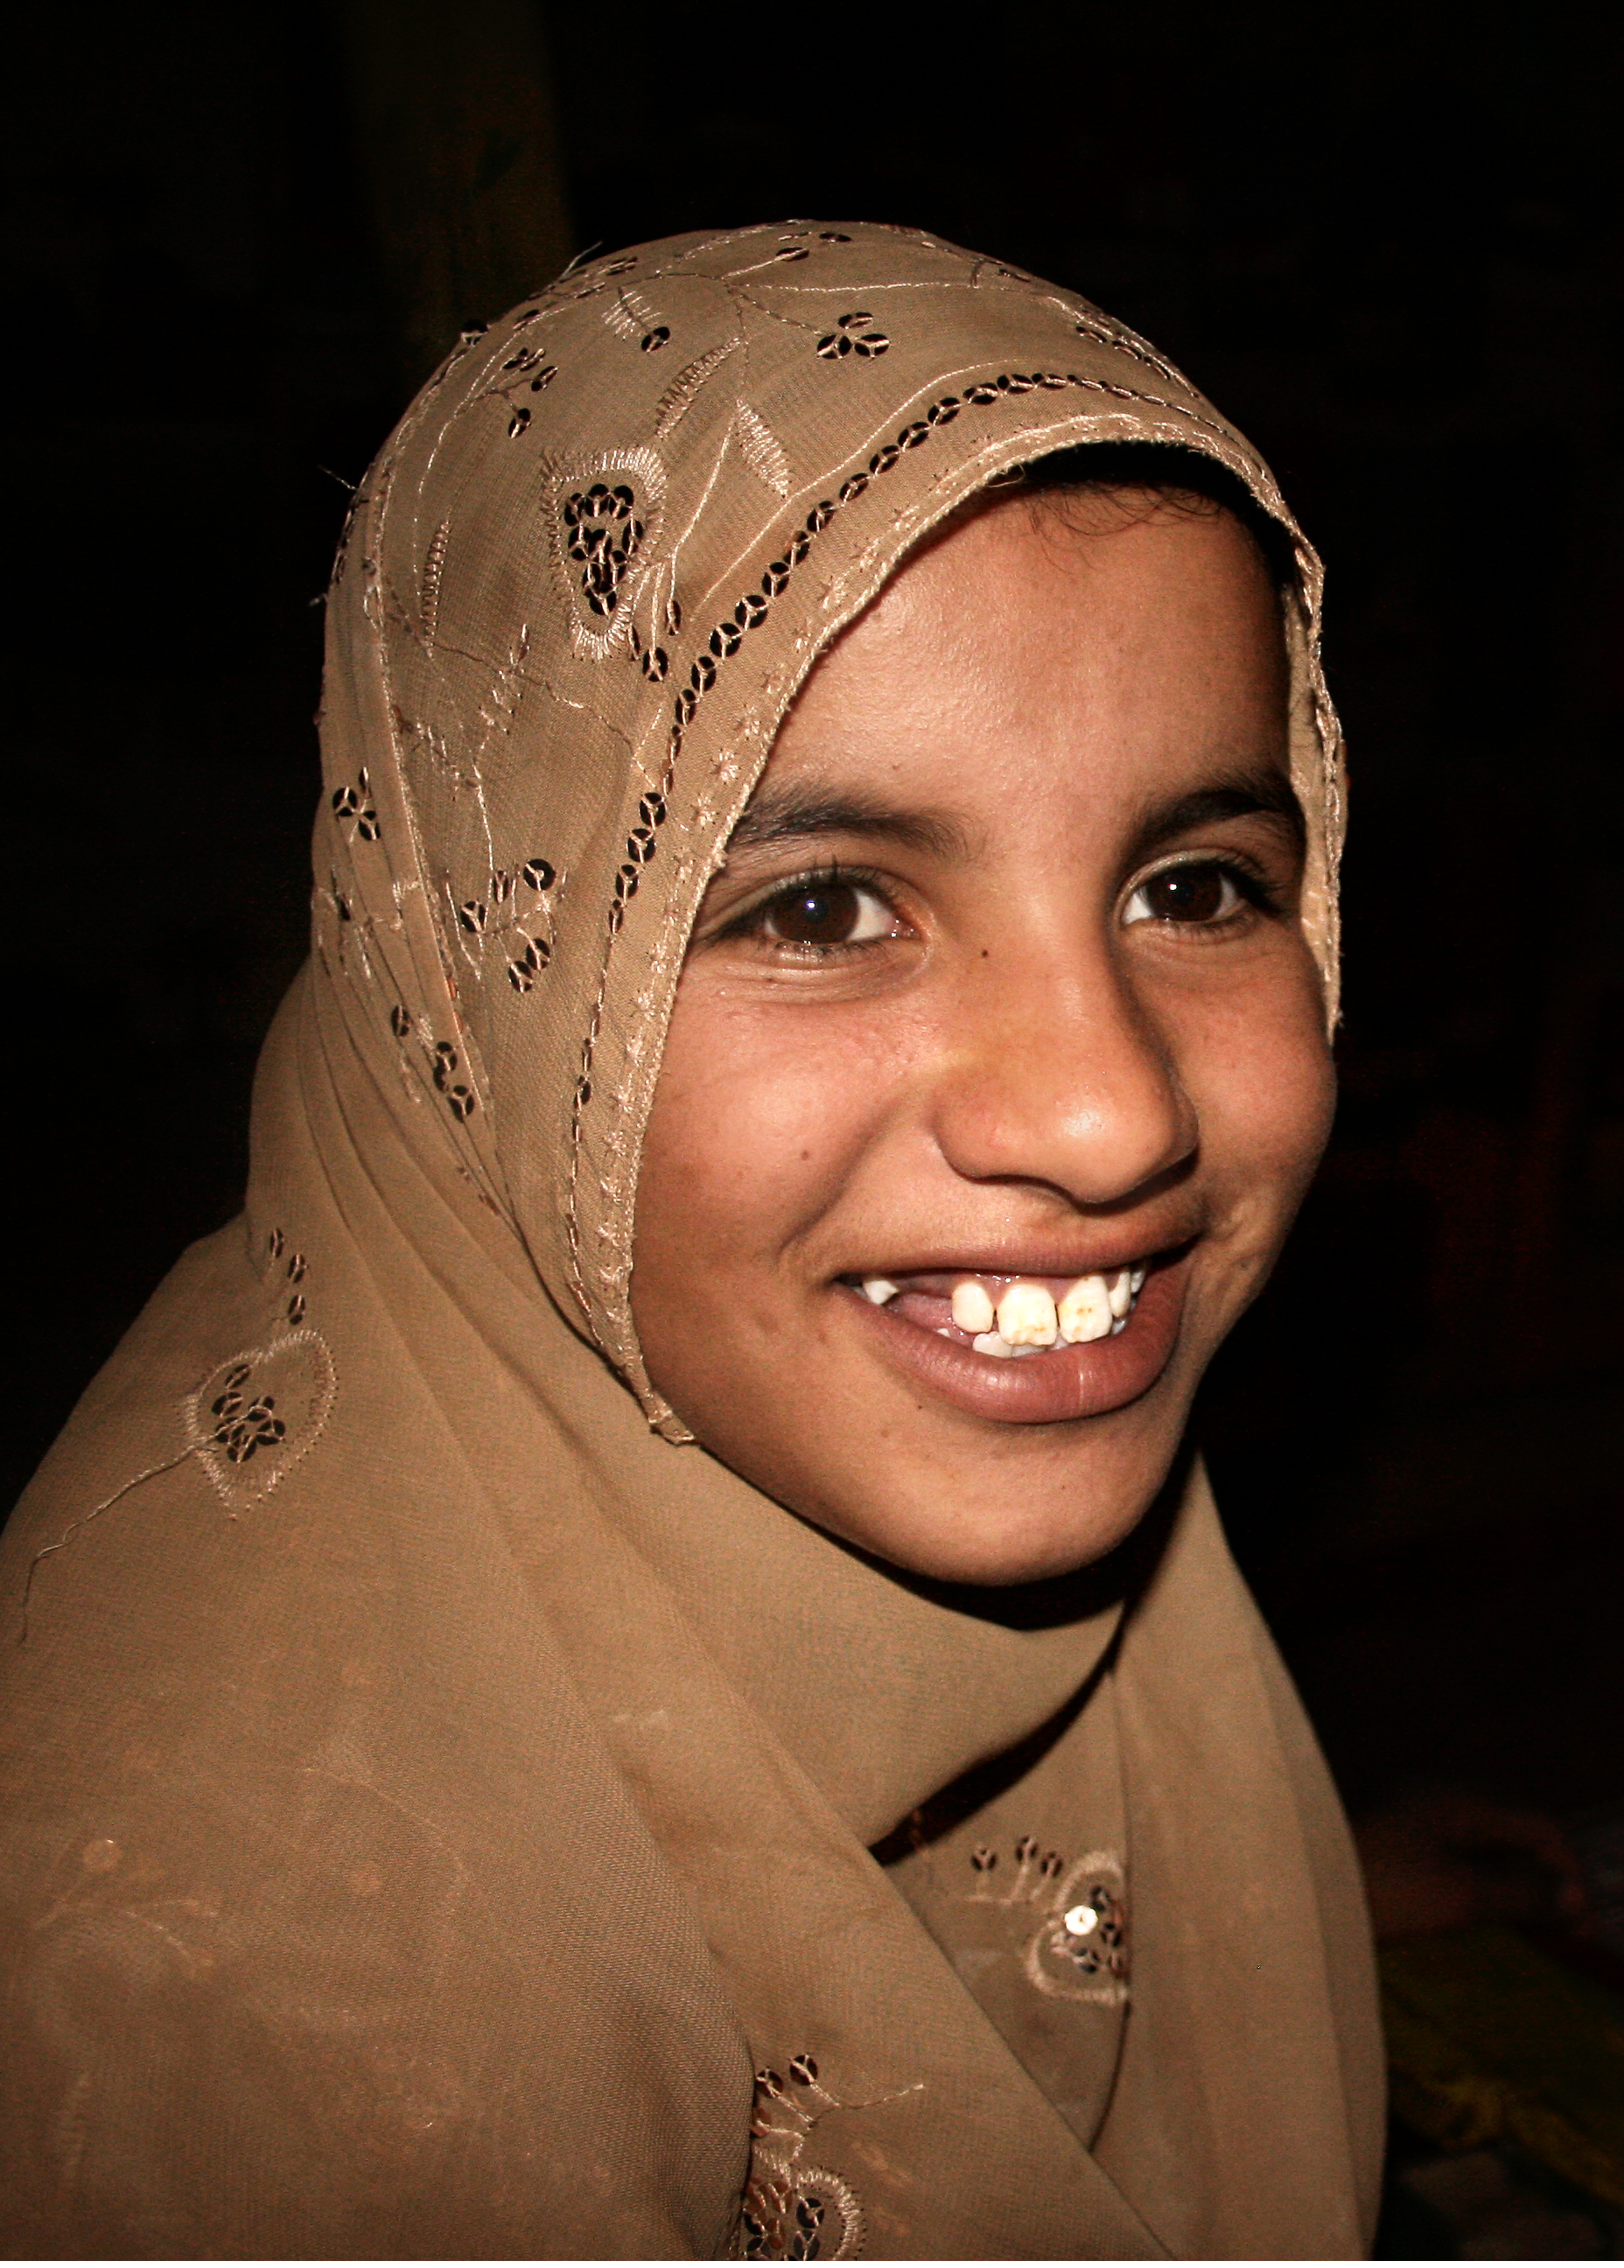 Muslim girl portait, Arab, Morocco, Sweet, Smiling, HQ Photo